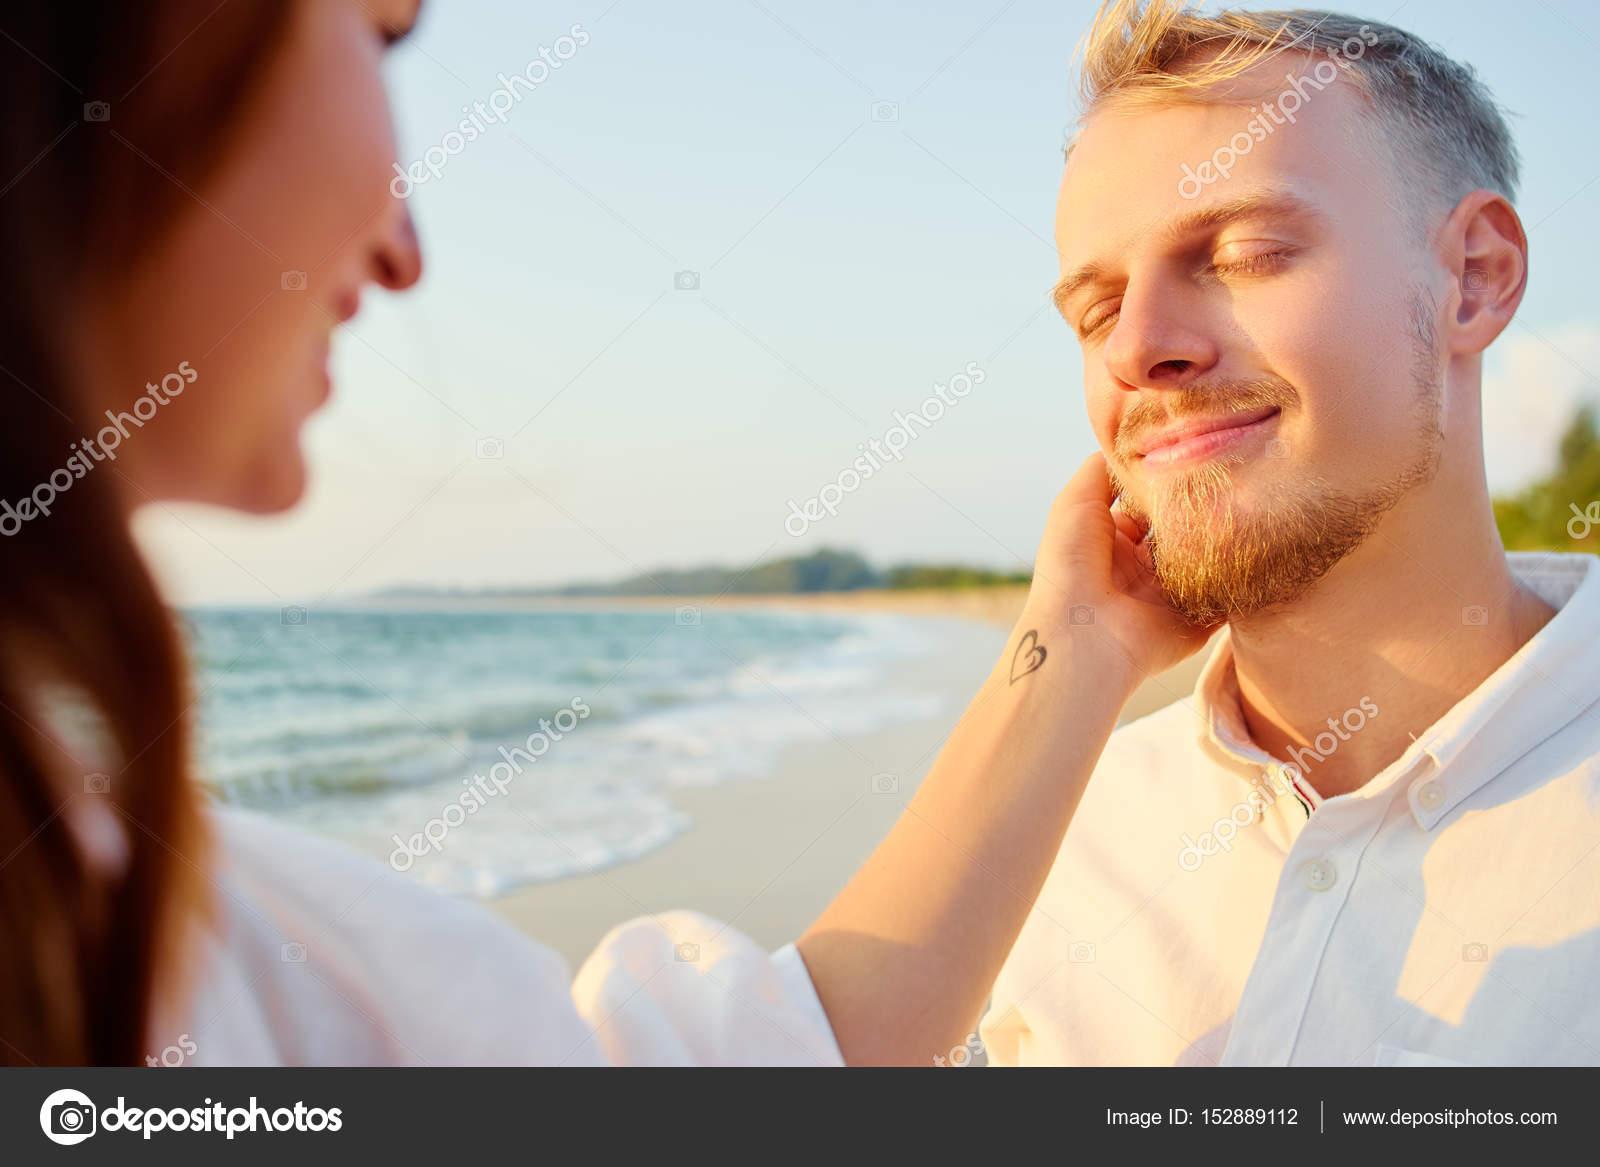 Der dating-ring-chat